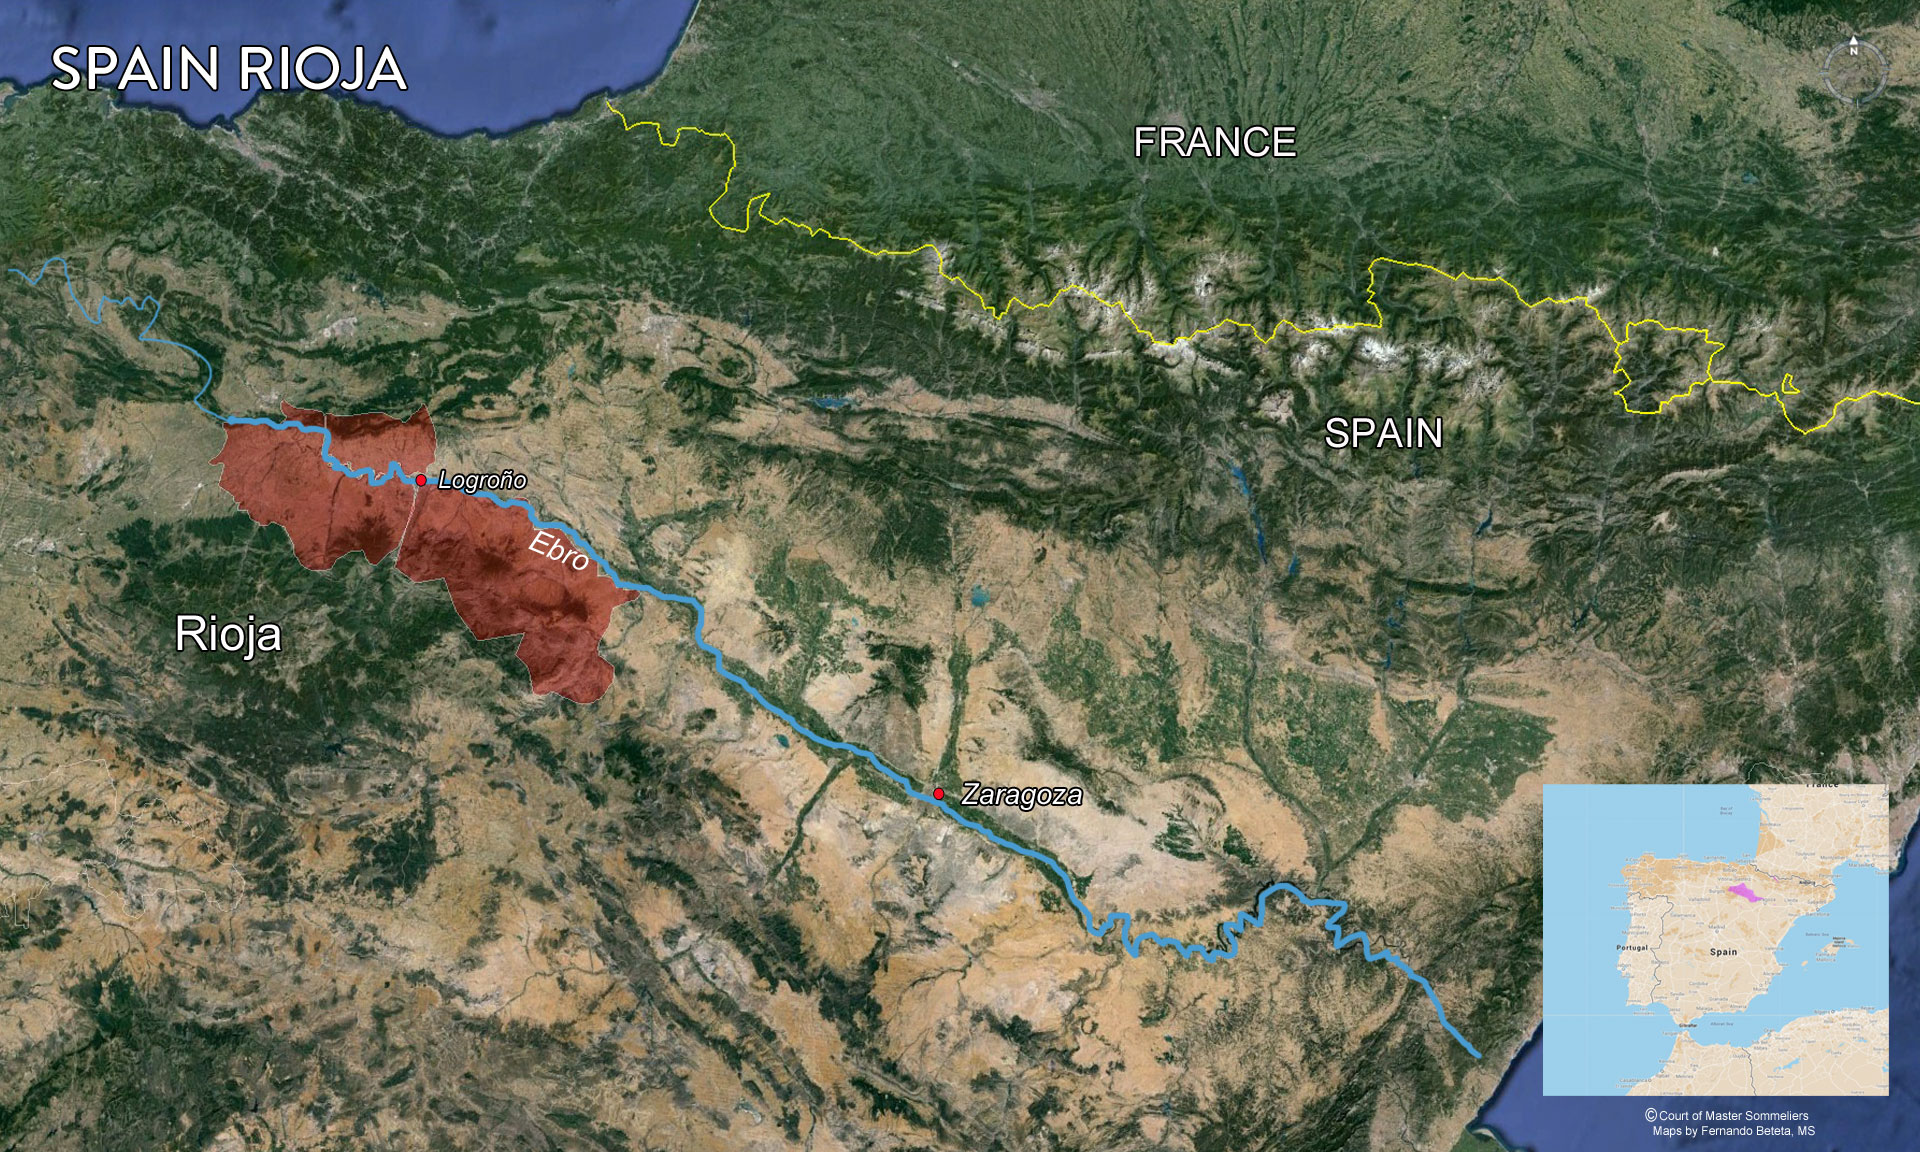 Overview of Rioja wine region and river Ebro.